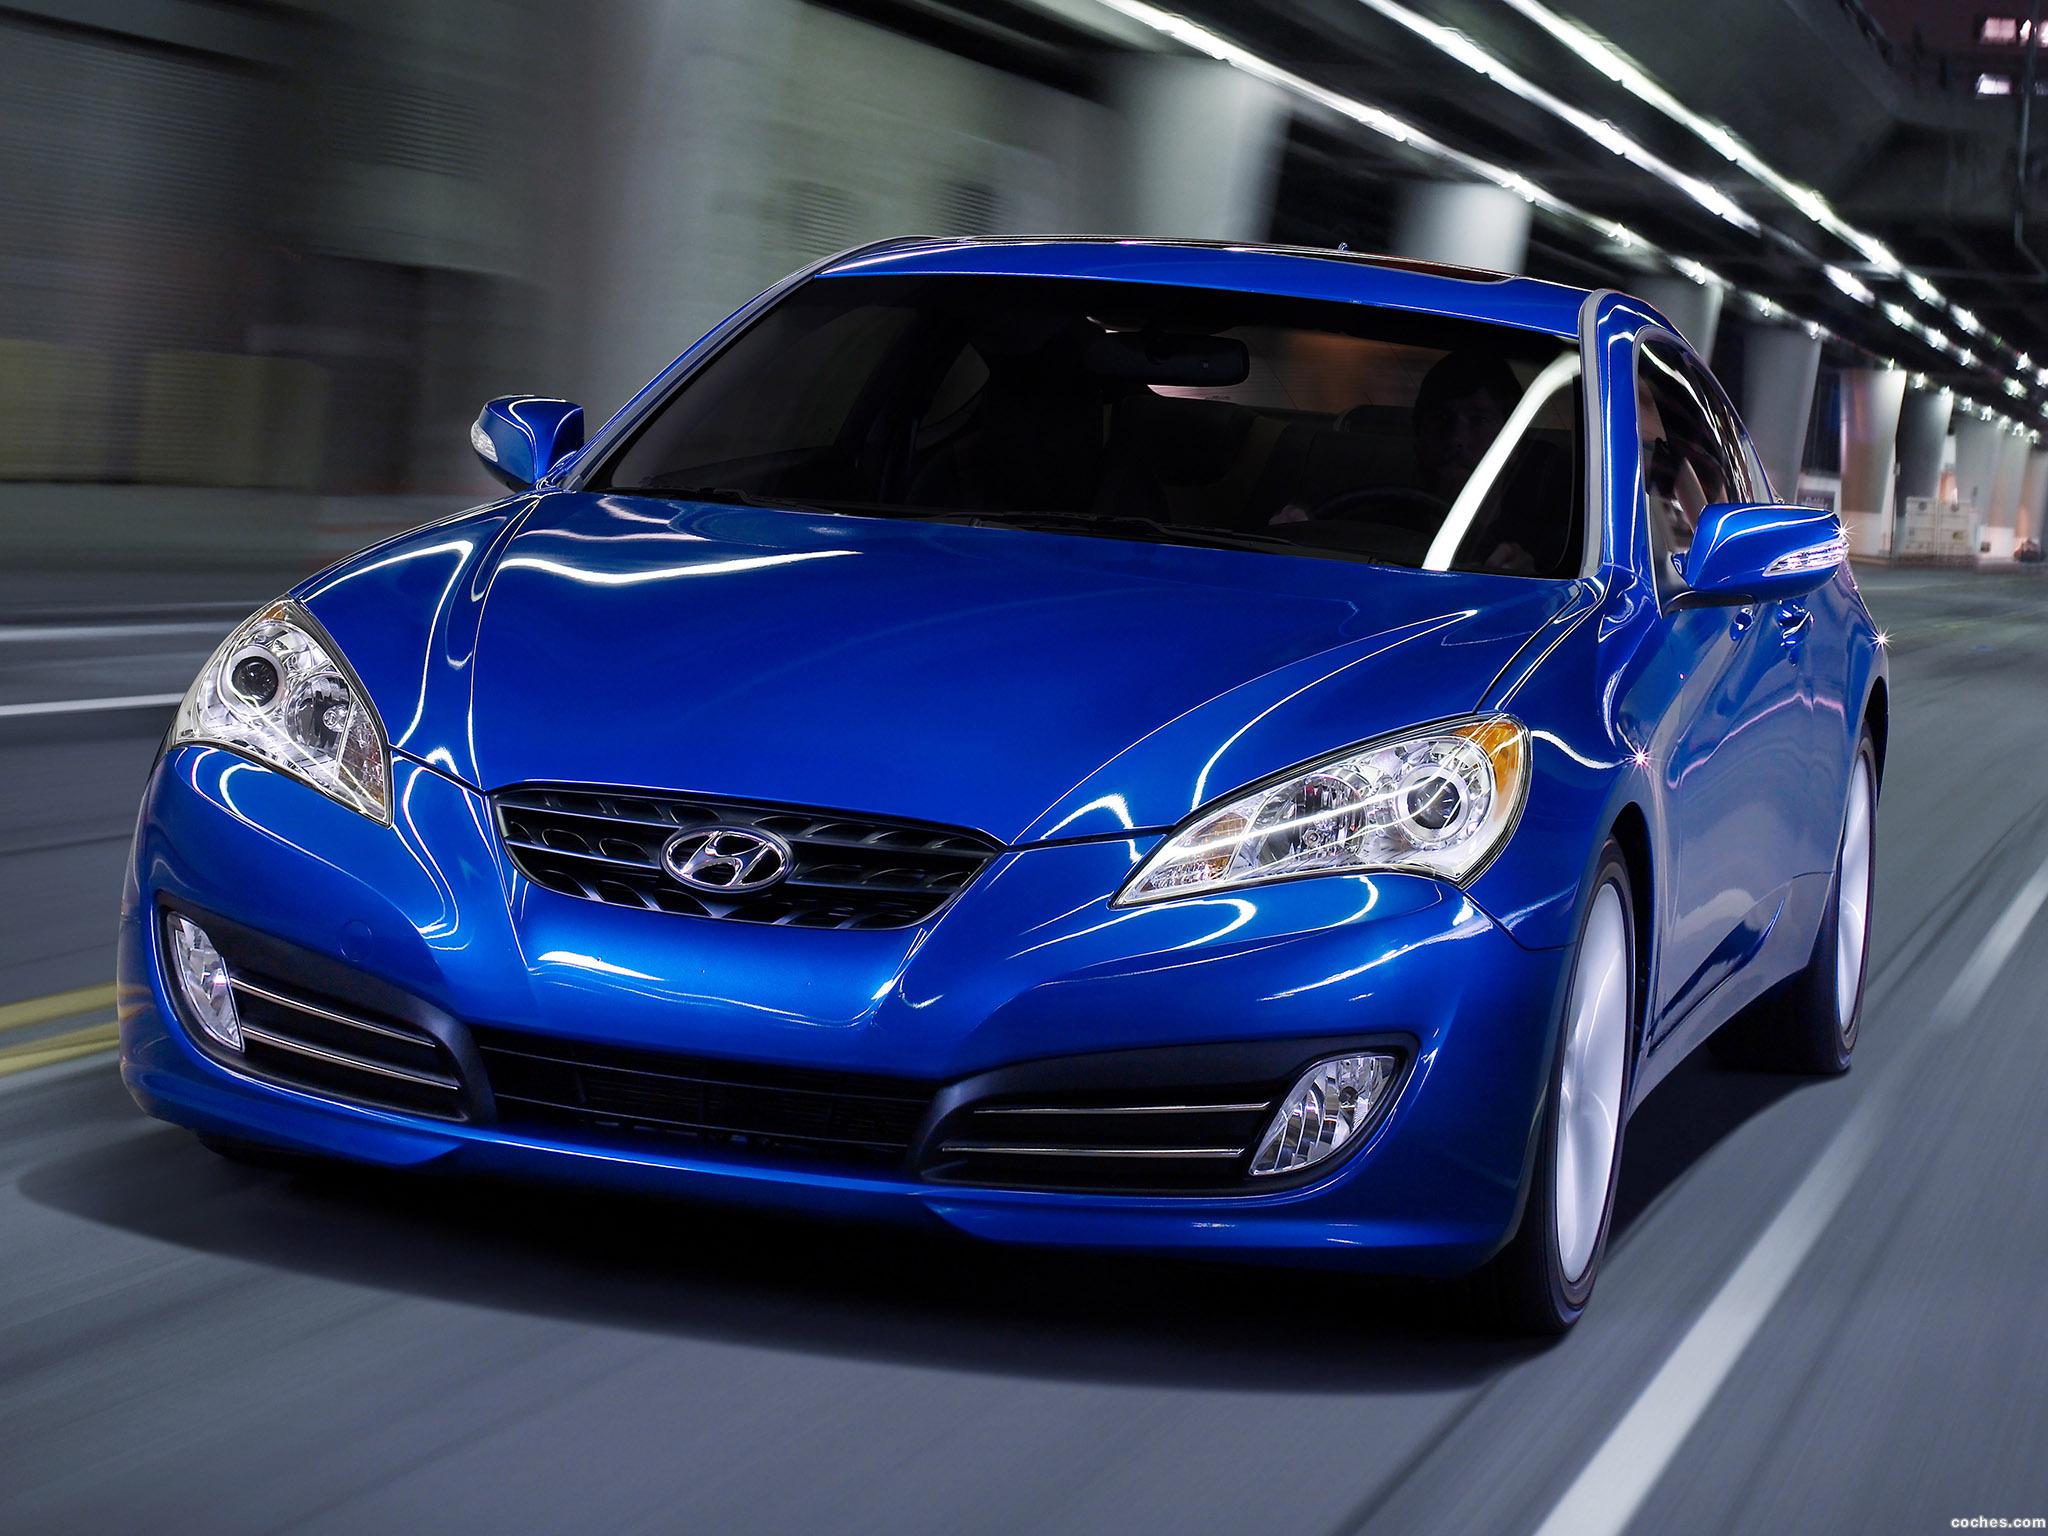 Foto 0 de Hyundai Genesis Coupe 2008